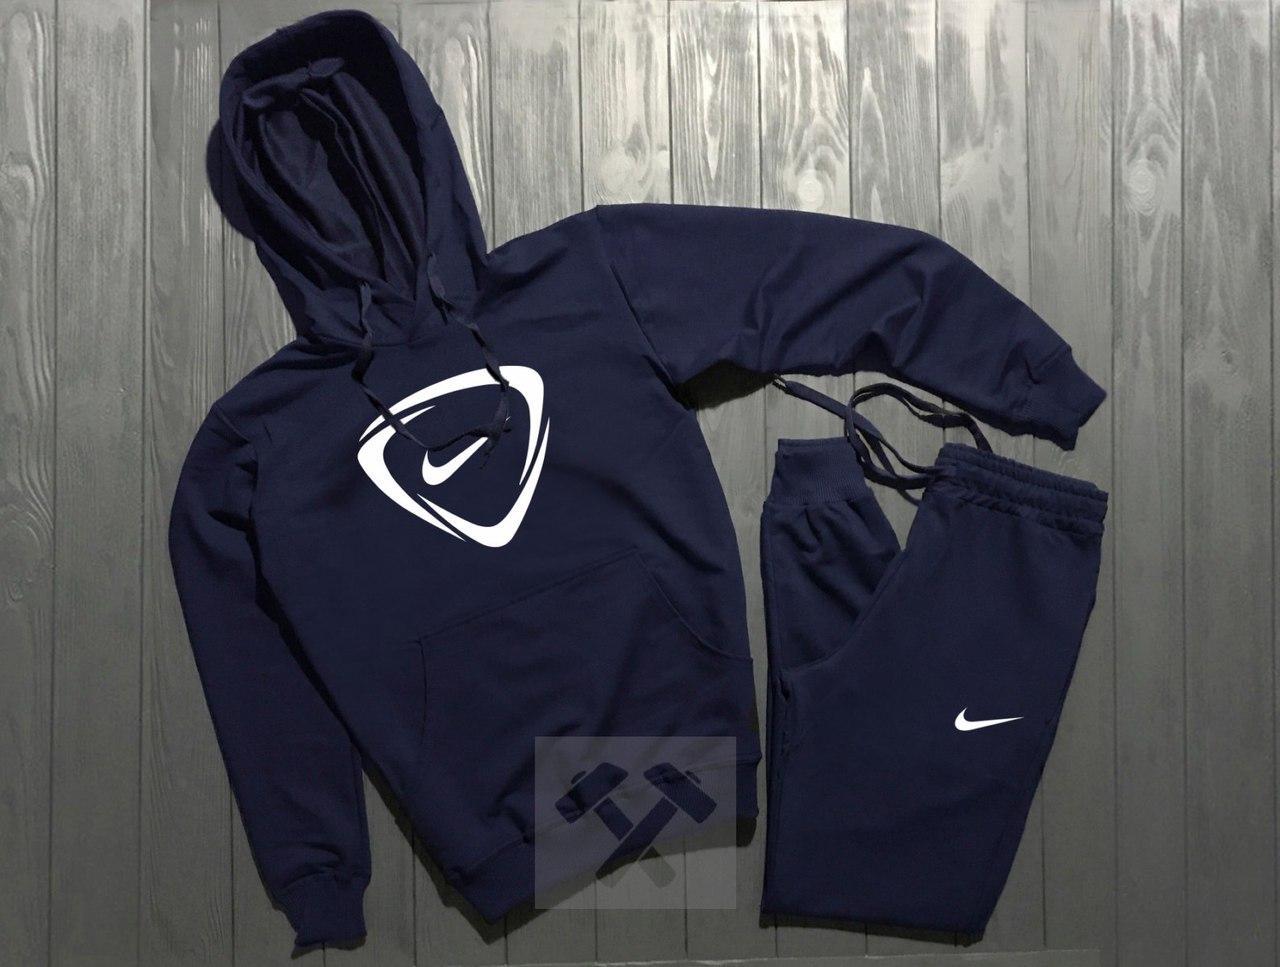 Весенний костюм спортивный Nike с капюшоном темно-синий топ реплика